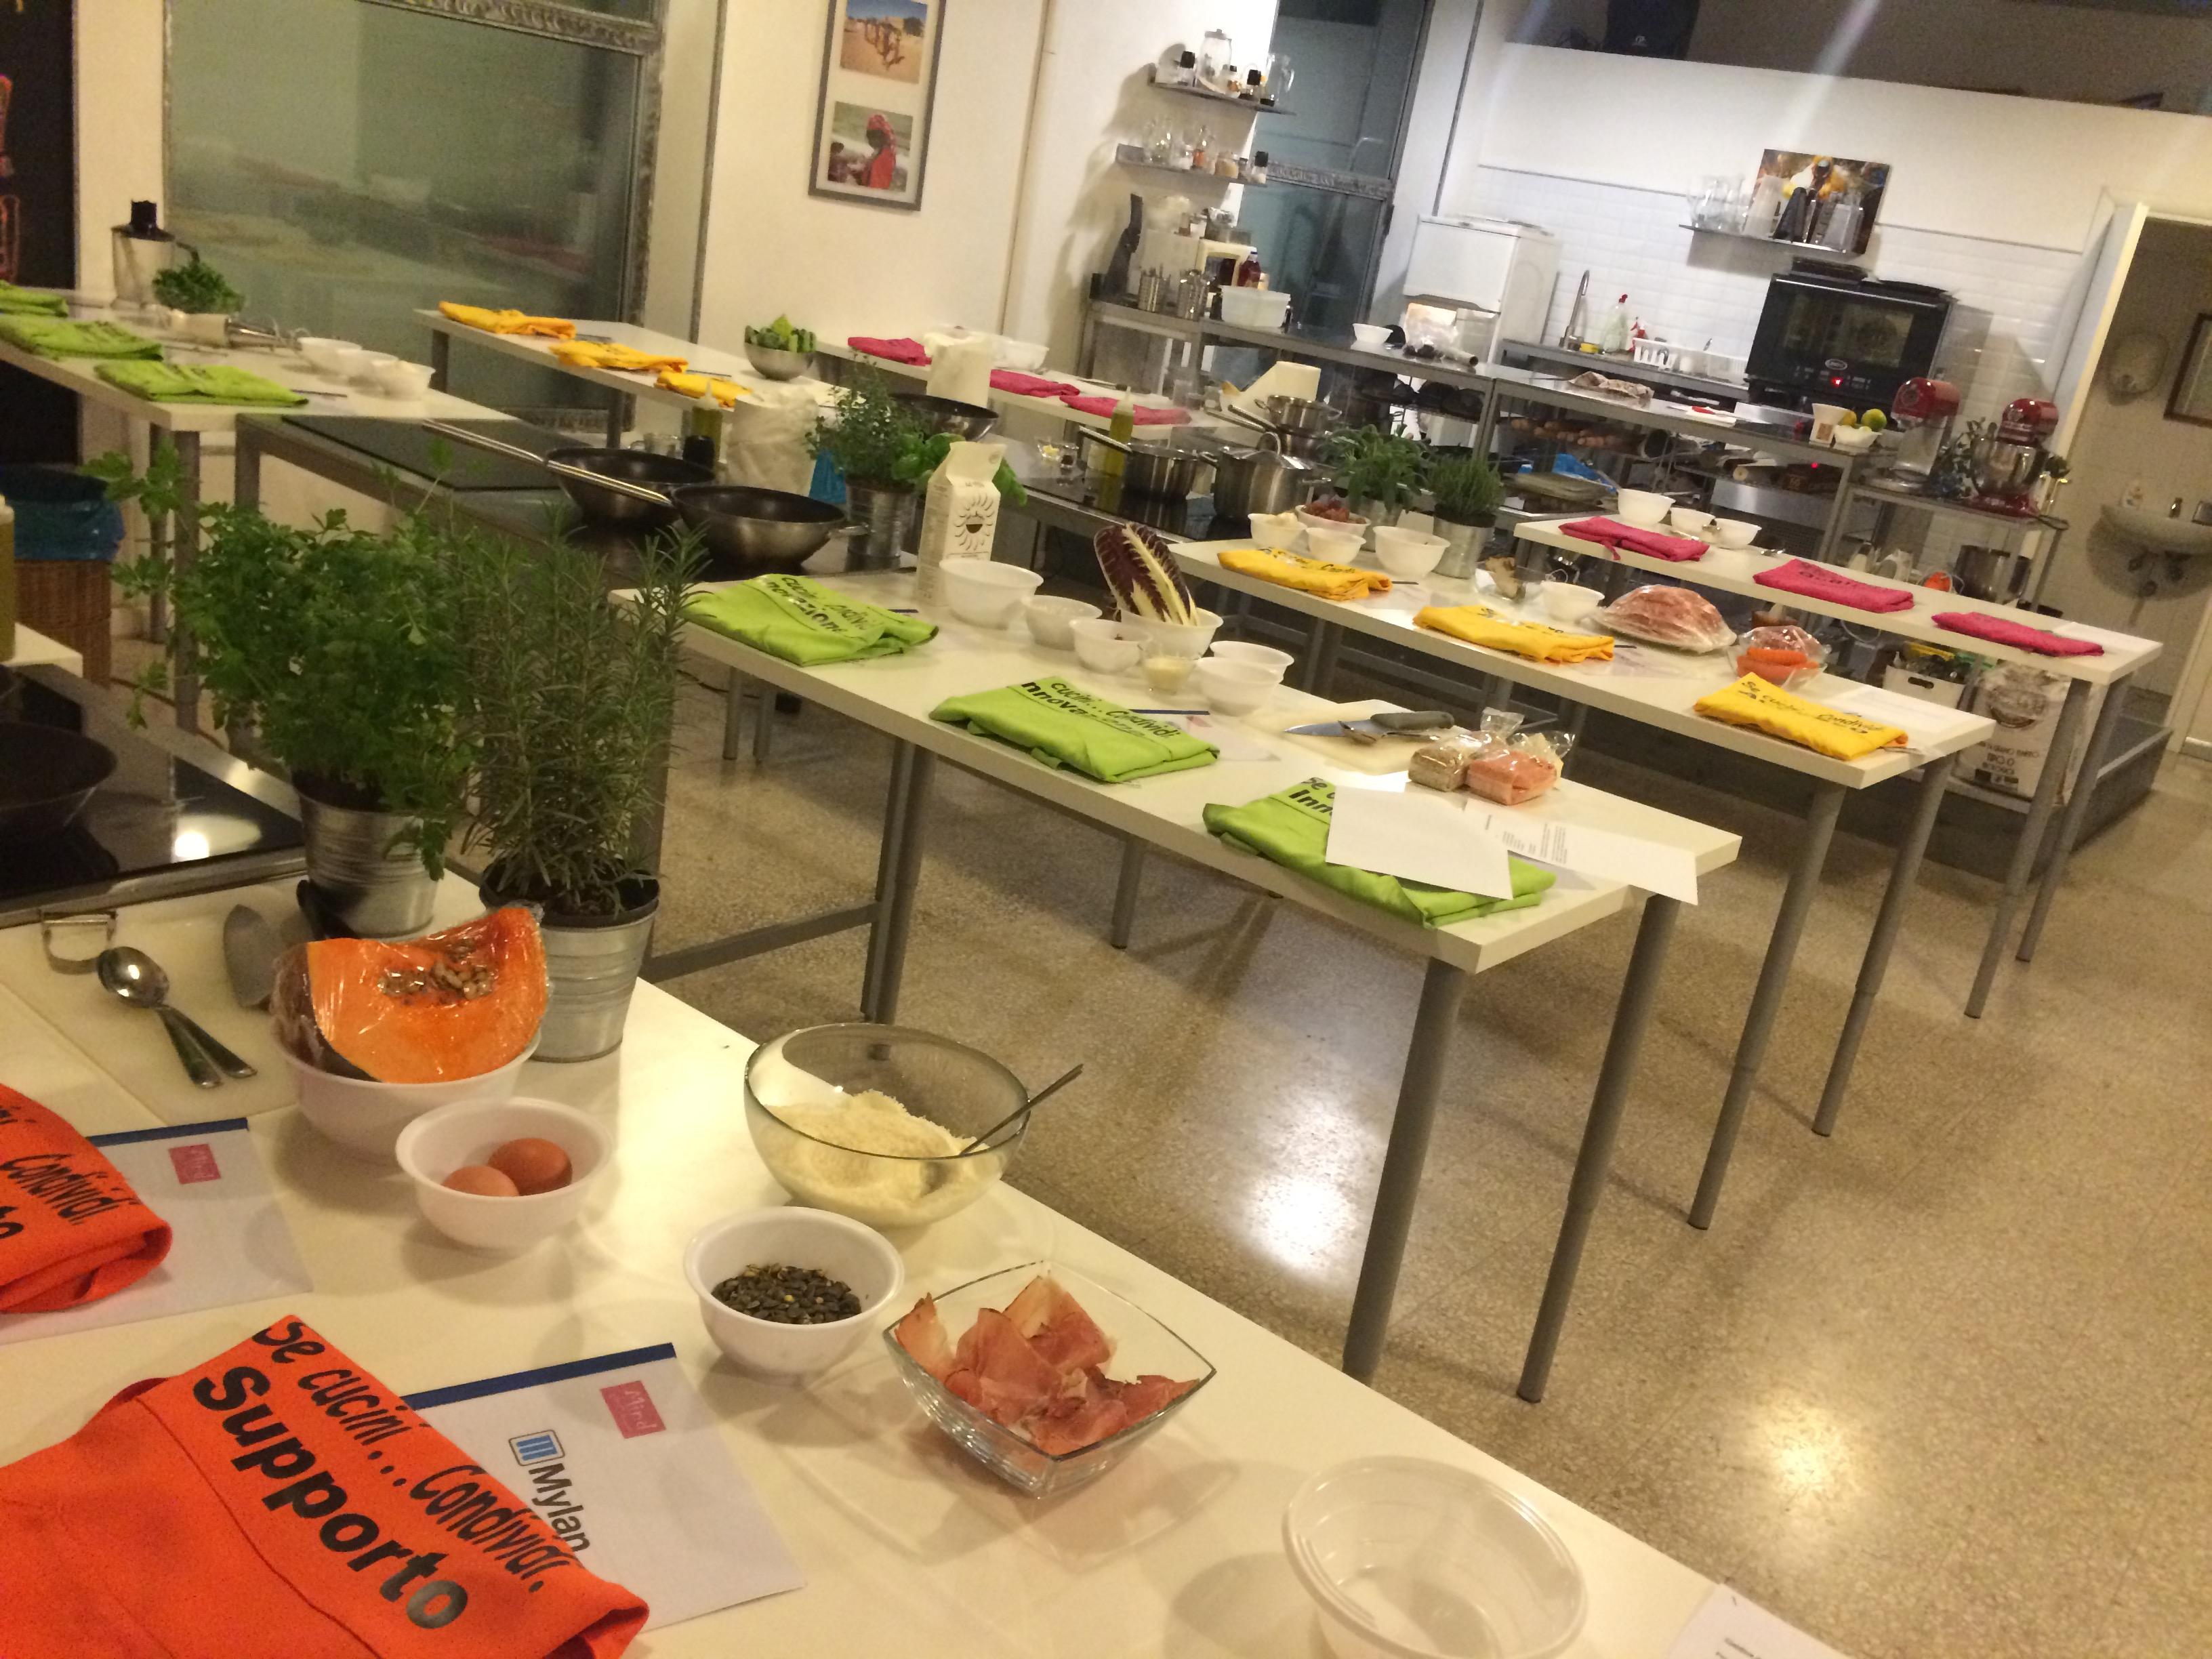 Img 4284 mind scuola di cucina roma - Scuola di cucina roma ...